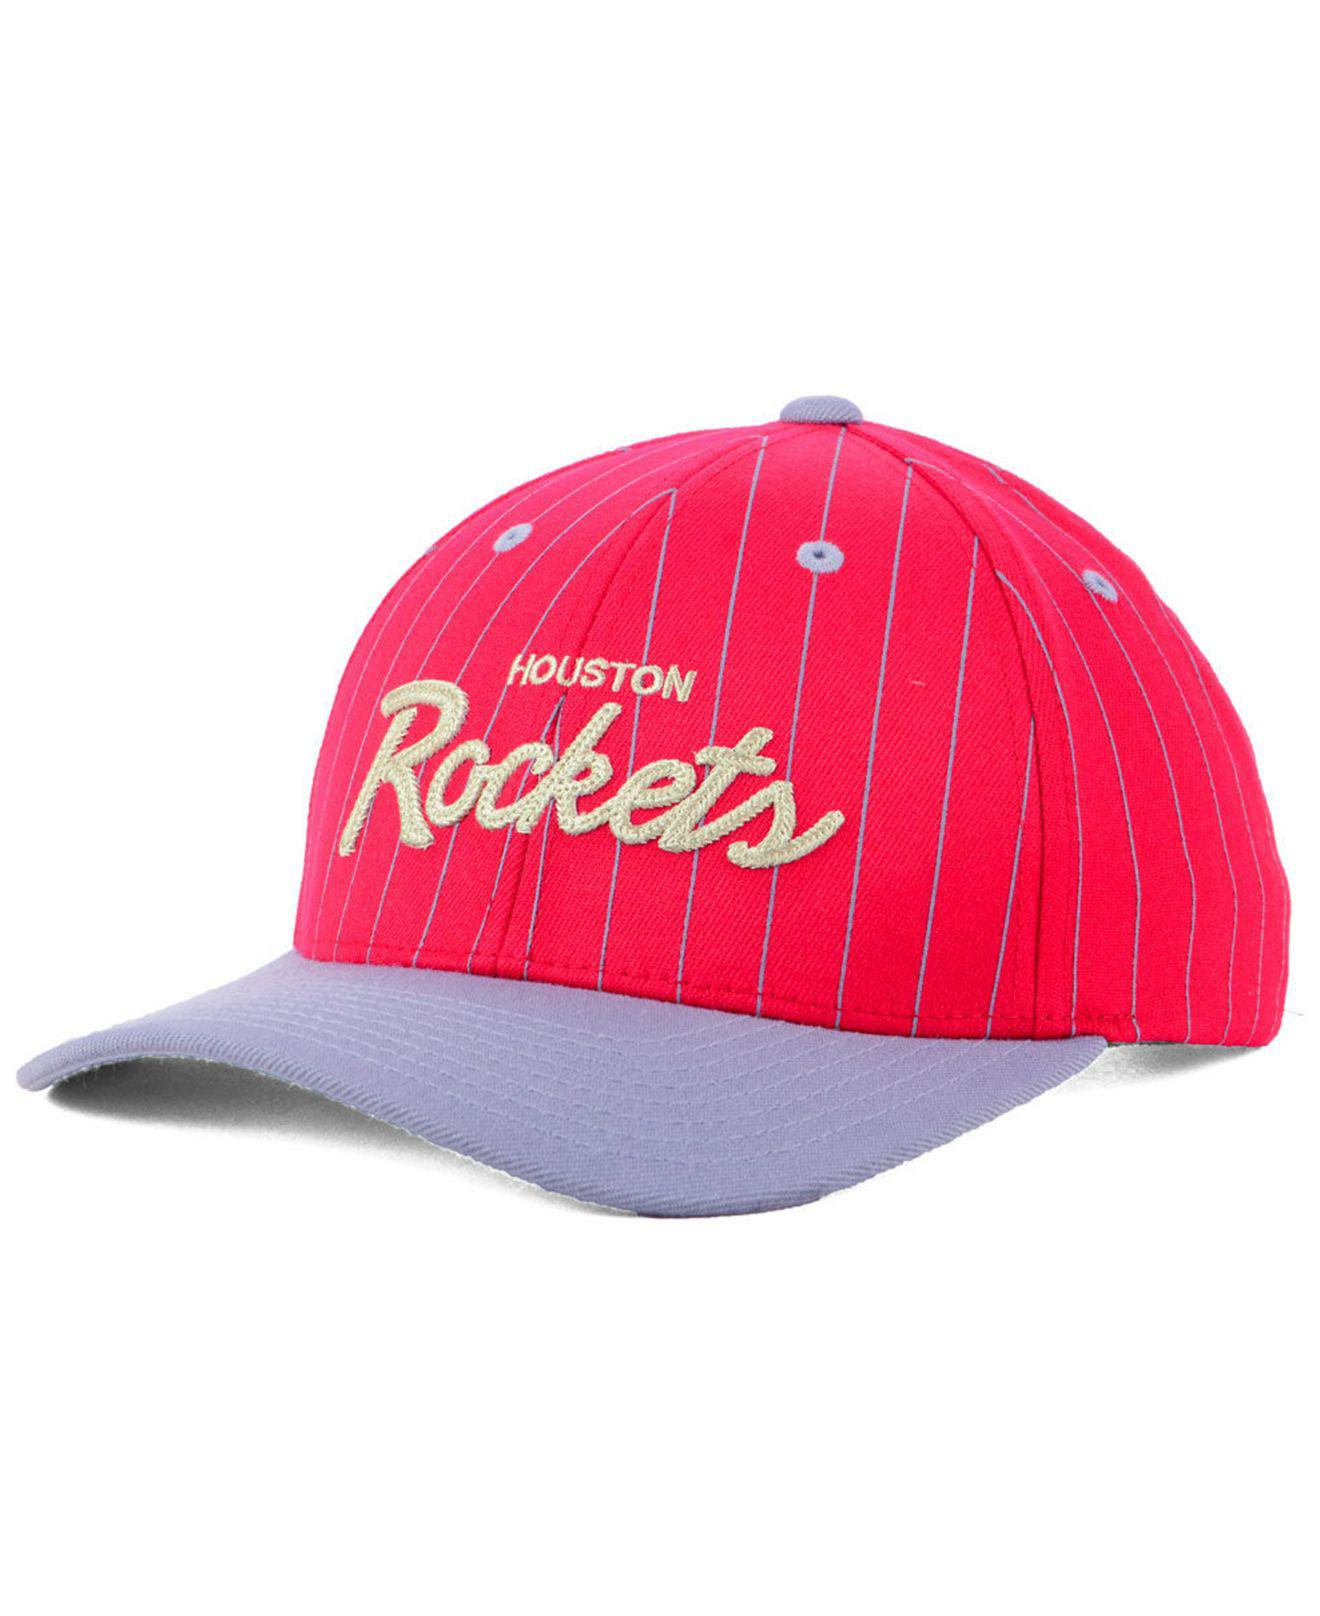 info for e780c e7efc Mitchell   Ness. Men s Red Houston Rockets Pinstripe Snapback Cap